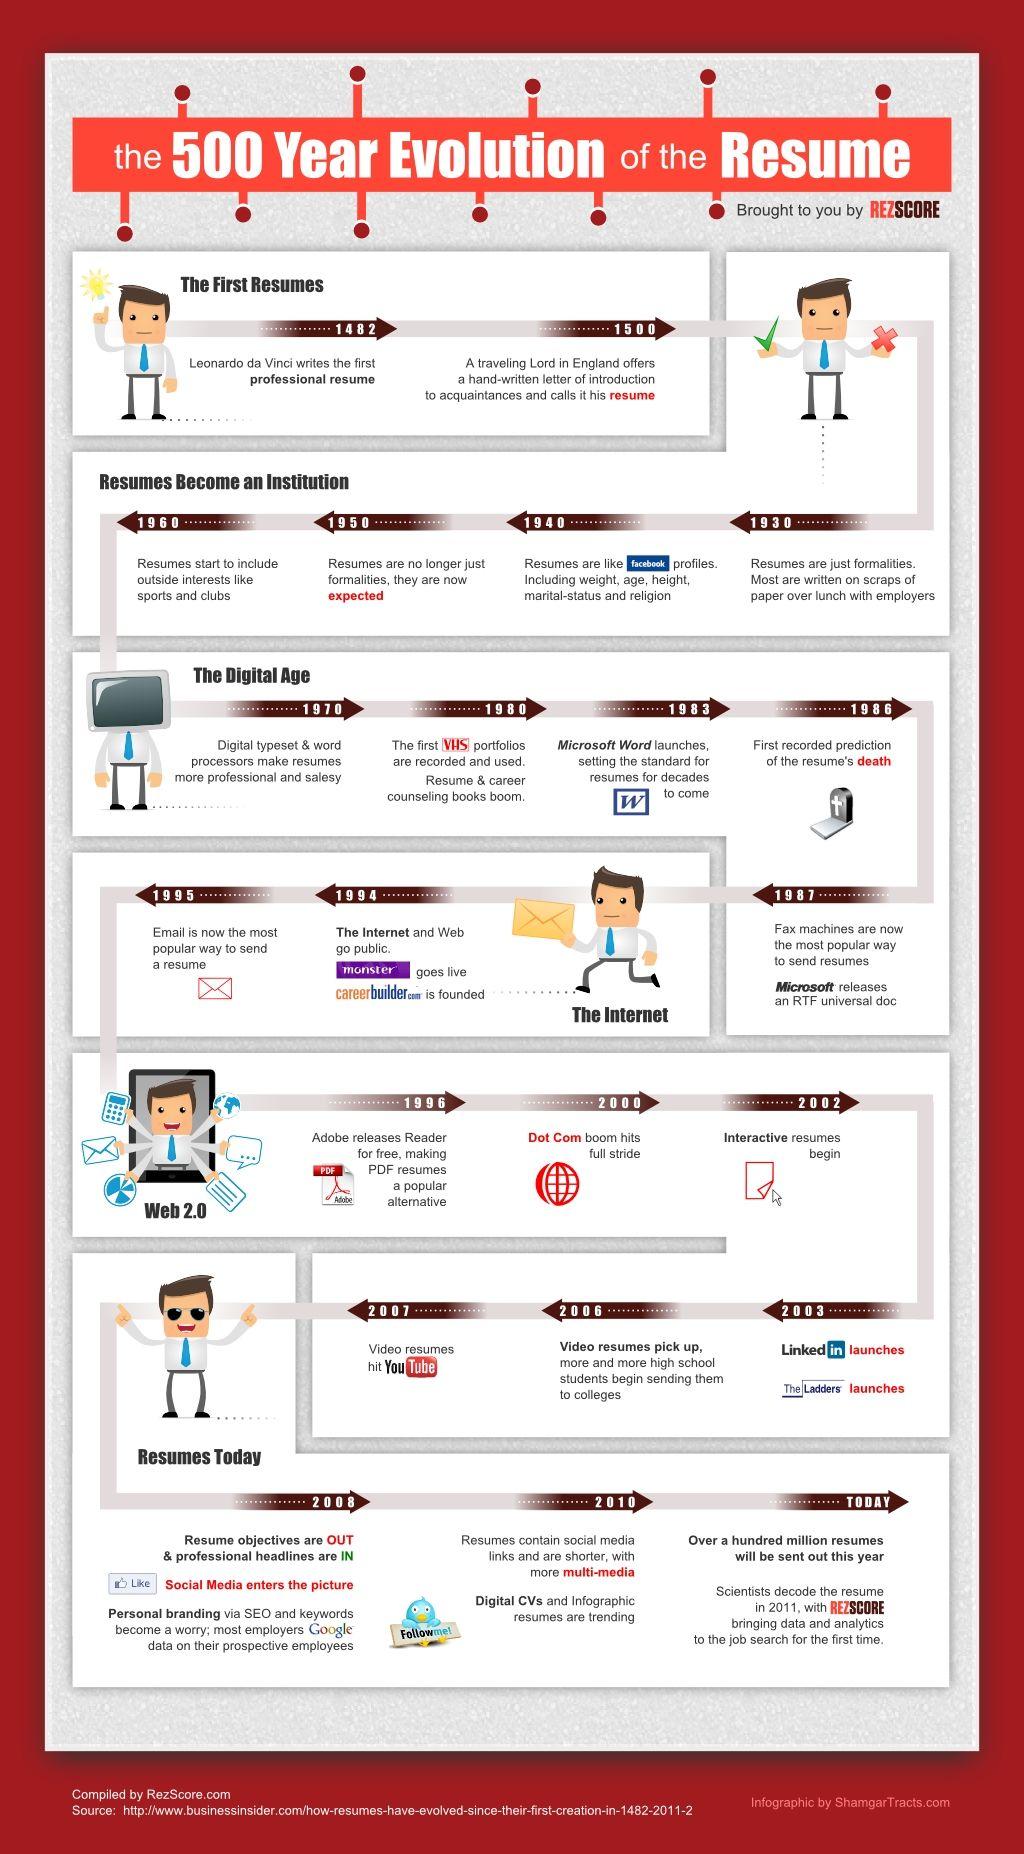 The 500 Year Evolution Of The Resume Recherche Emploi Technologie Educative Recrutement